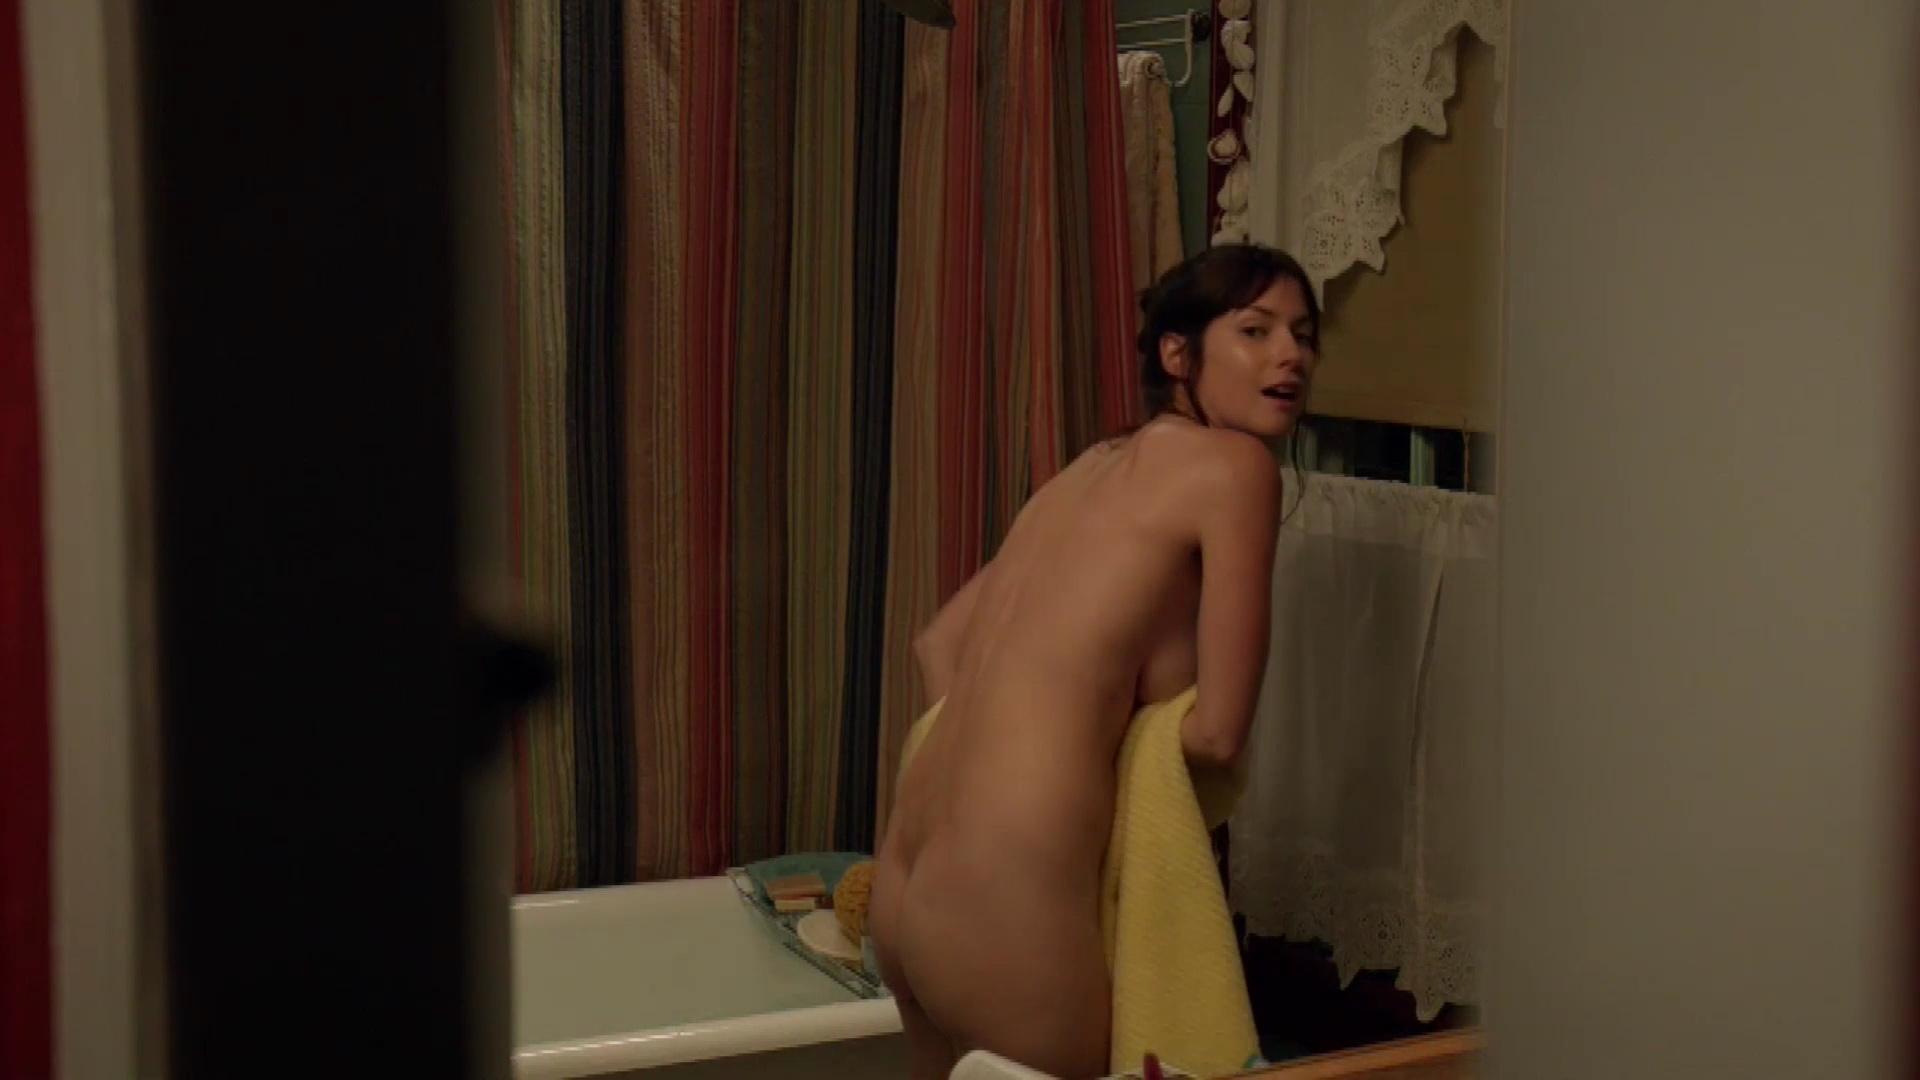 Laura ingraham sexy pic